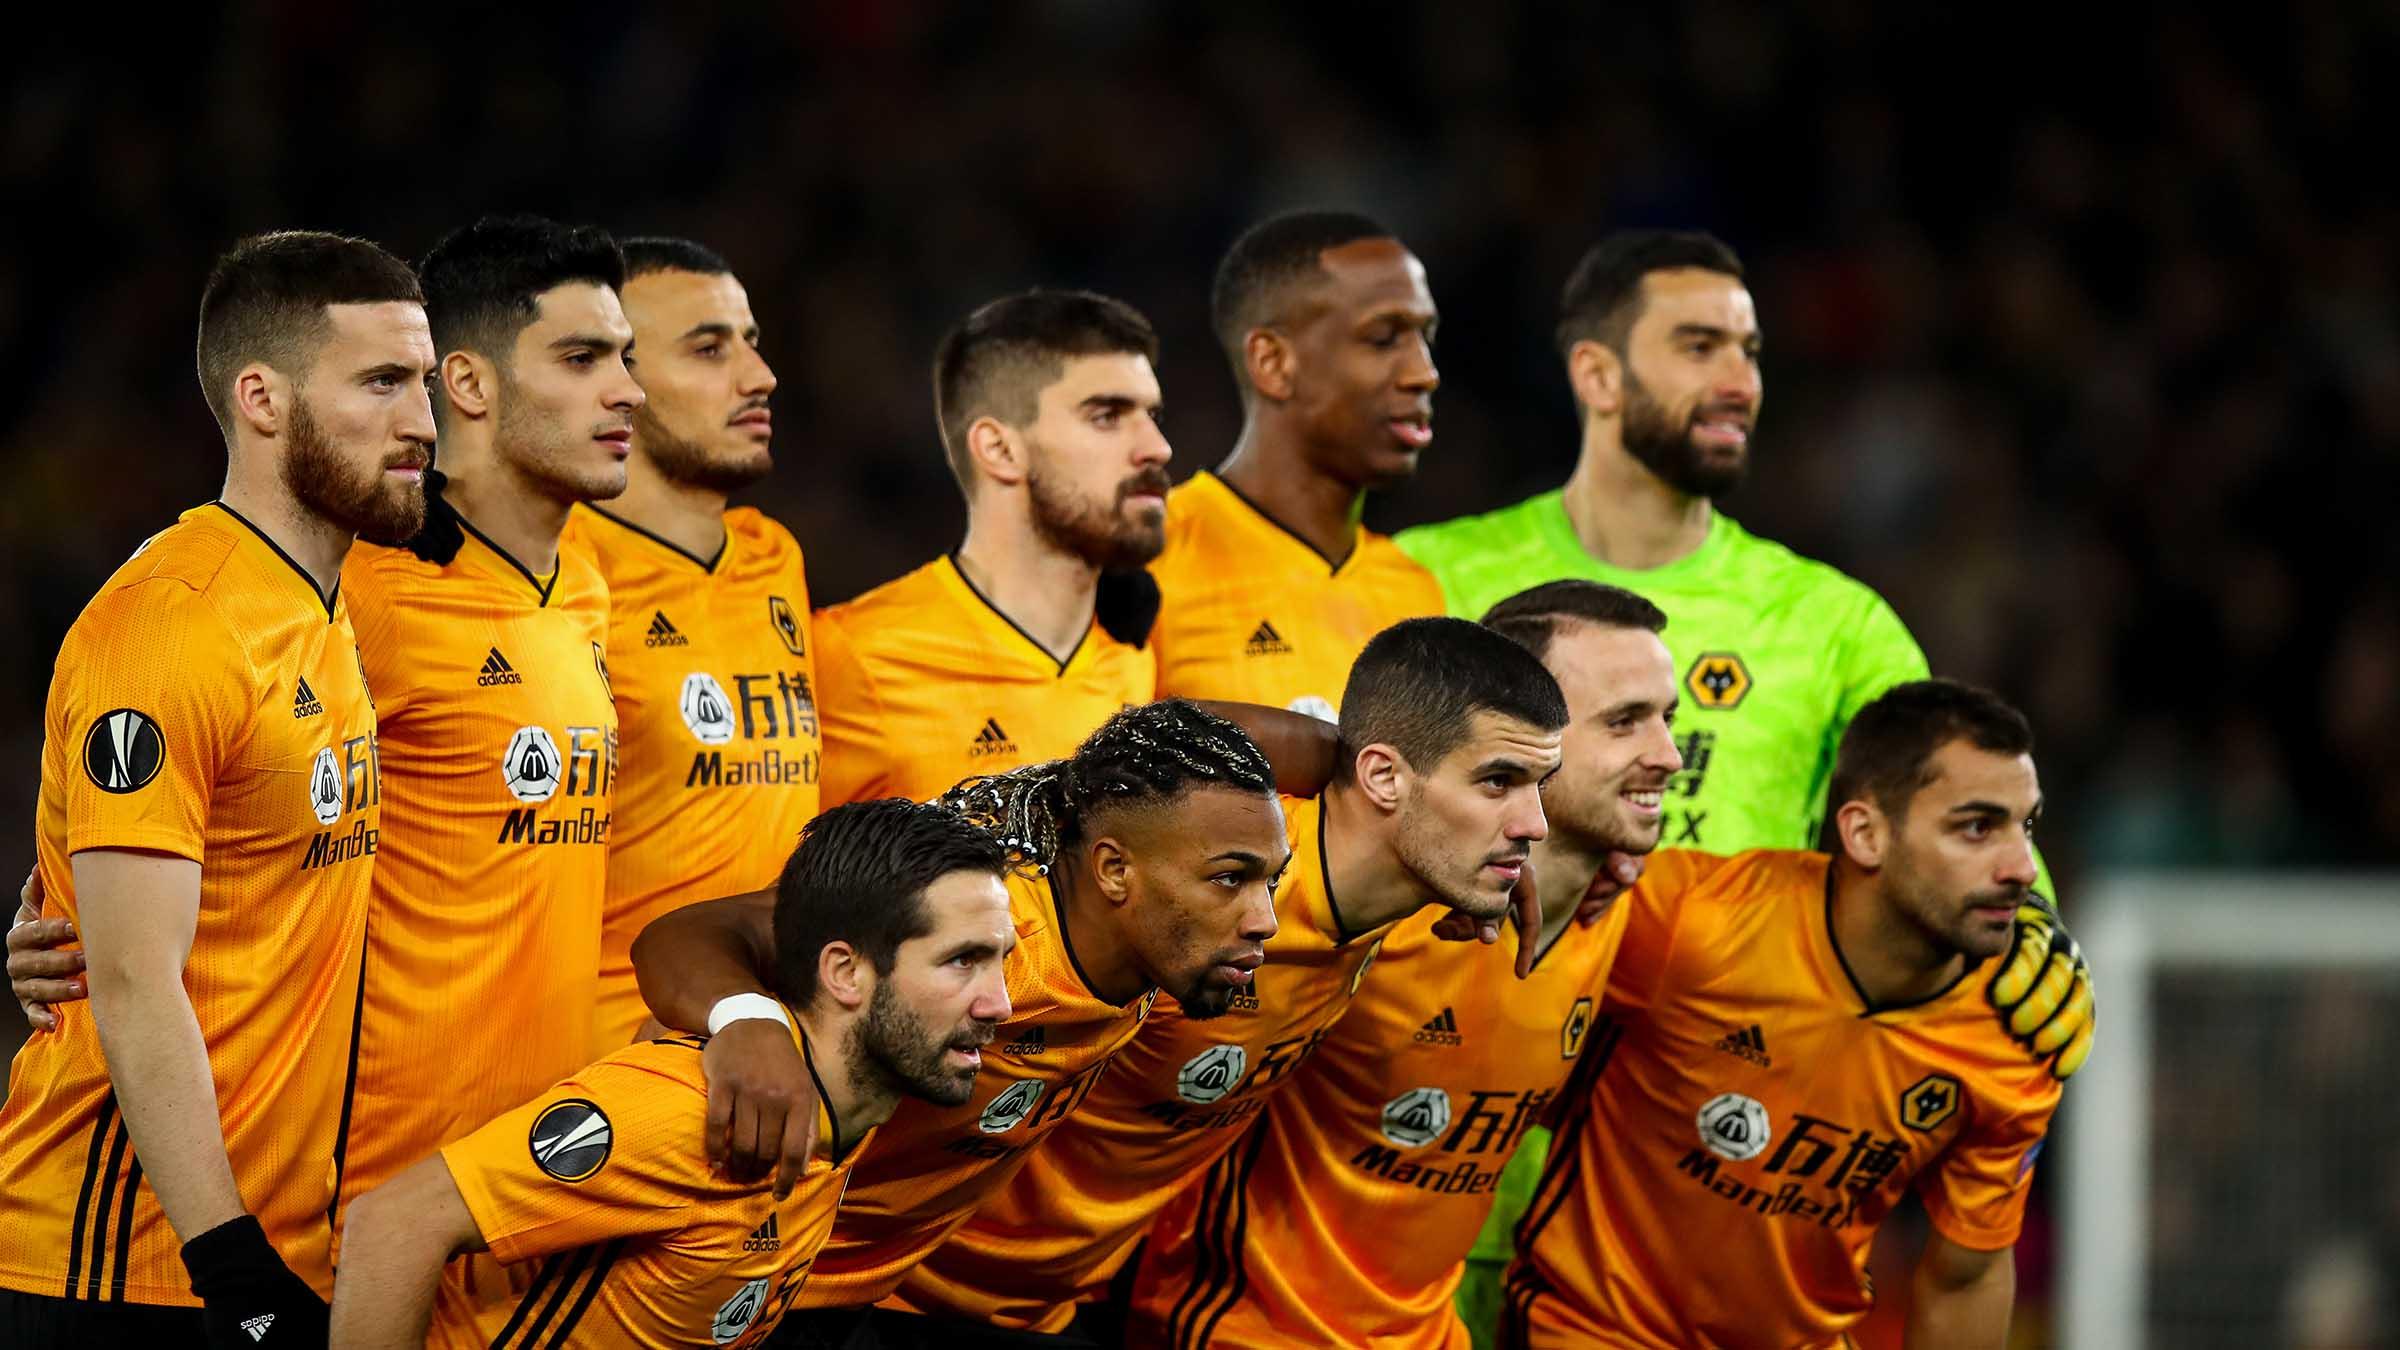 Wolves 4-0 Espanyol | 5 things we spotted | Wolverhampton ...